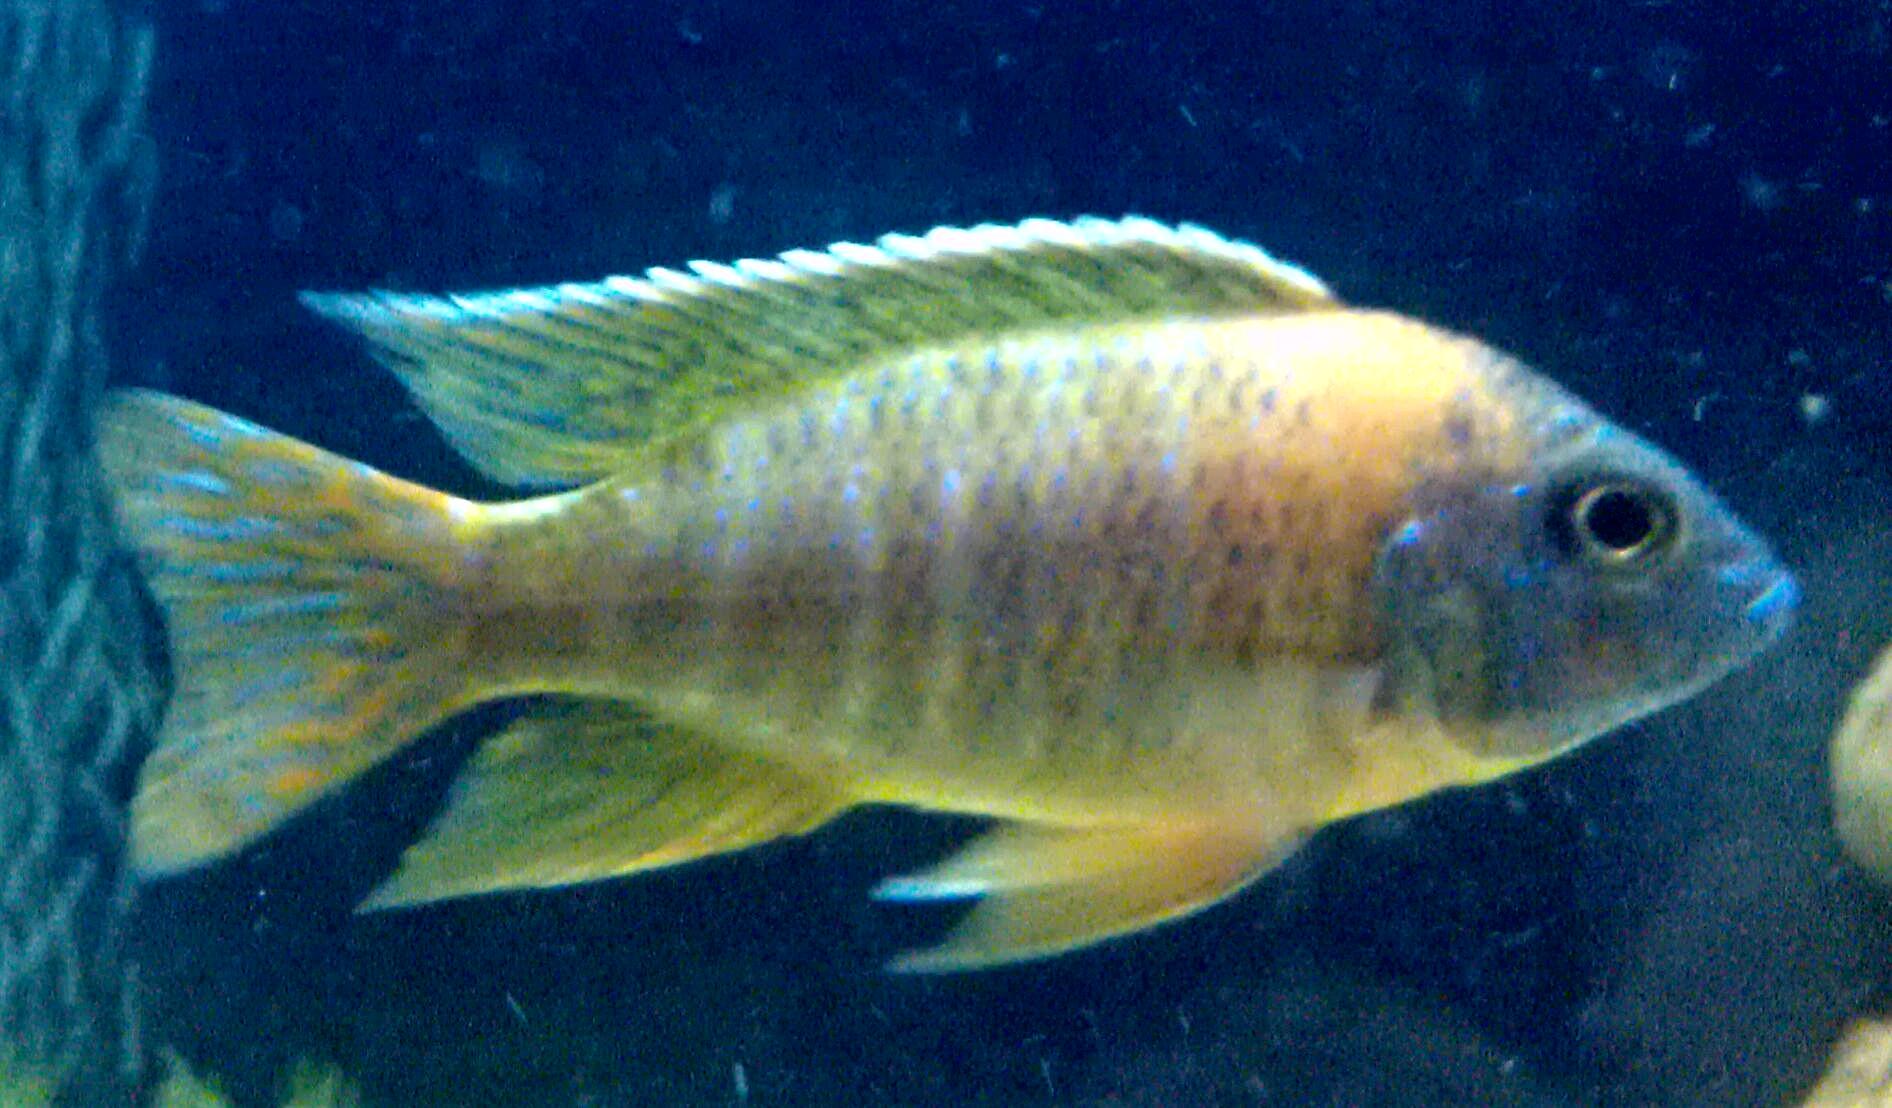 Lake Malawi and Aquarium Stocking Cichlids - Aquarium Advice